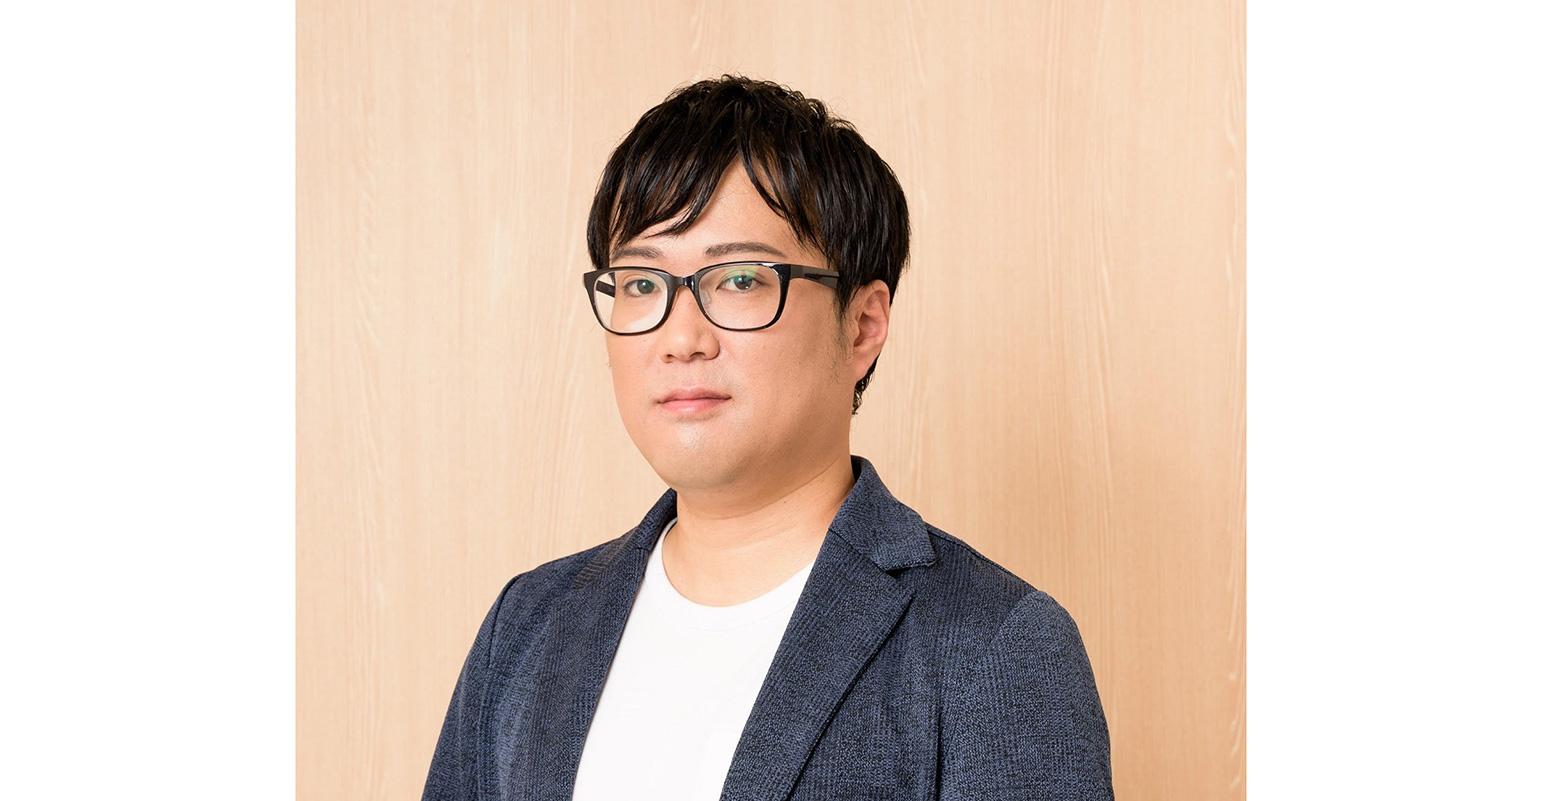 プライズ株式会社 代表取締役 内田 孝輔